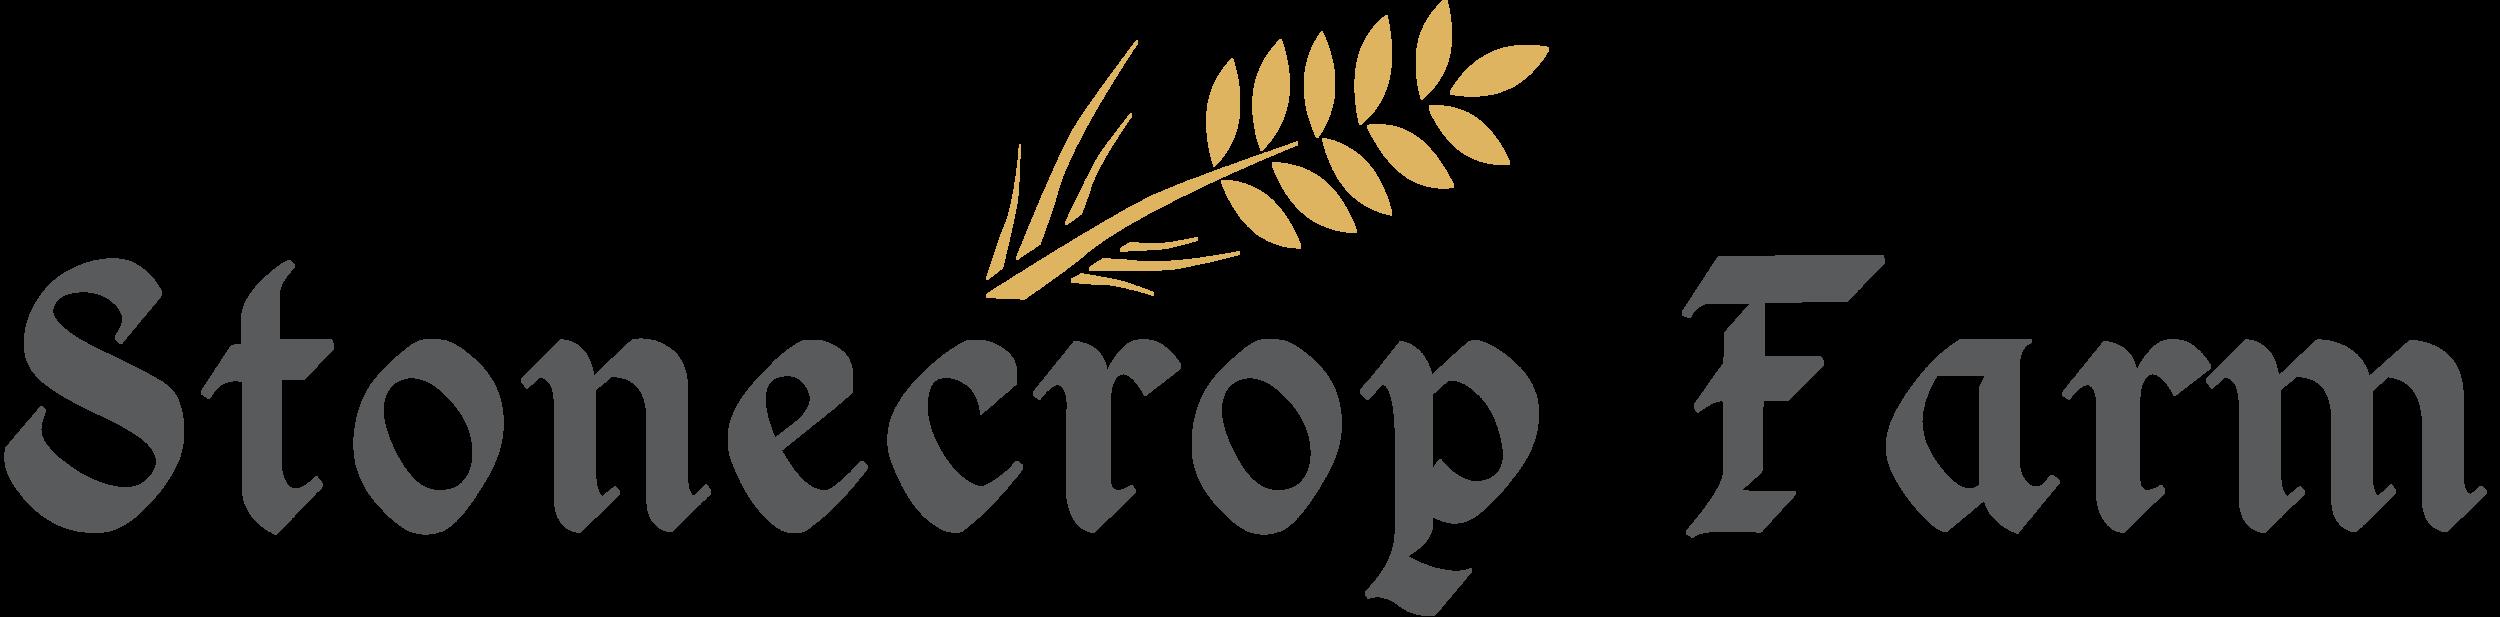 Stonecrop Farm Logo _ 595a5a Gray w. Wheat-1.png